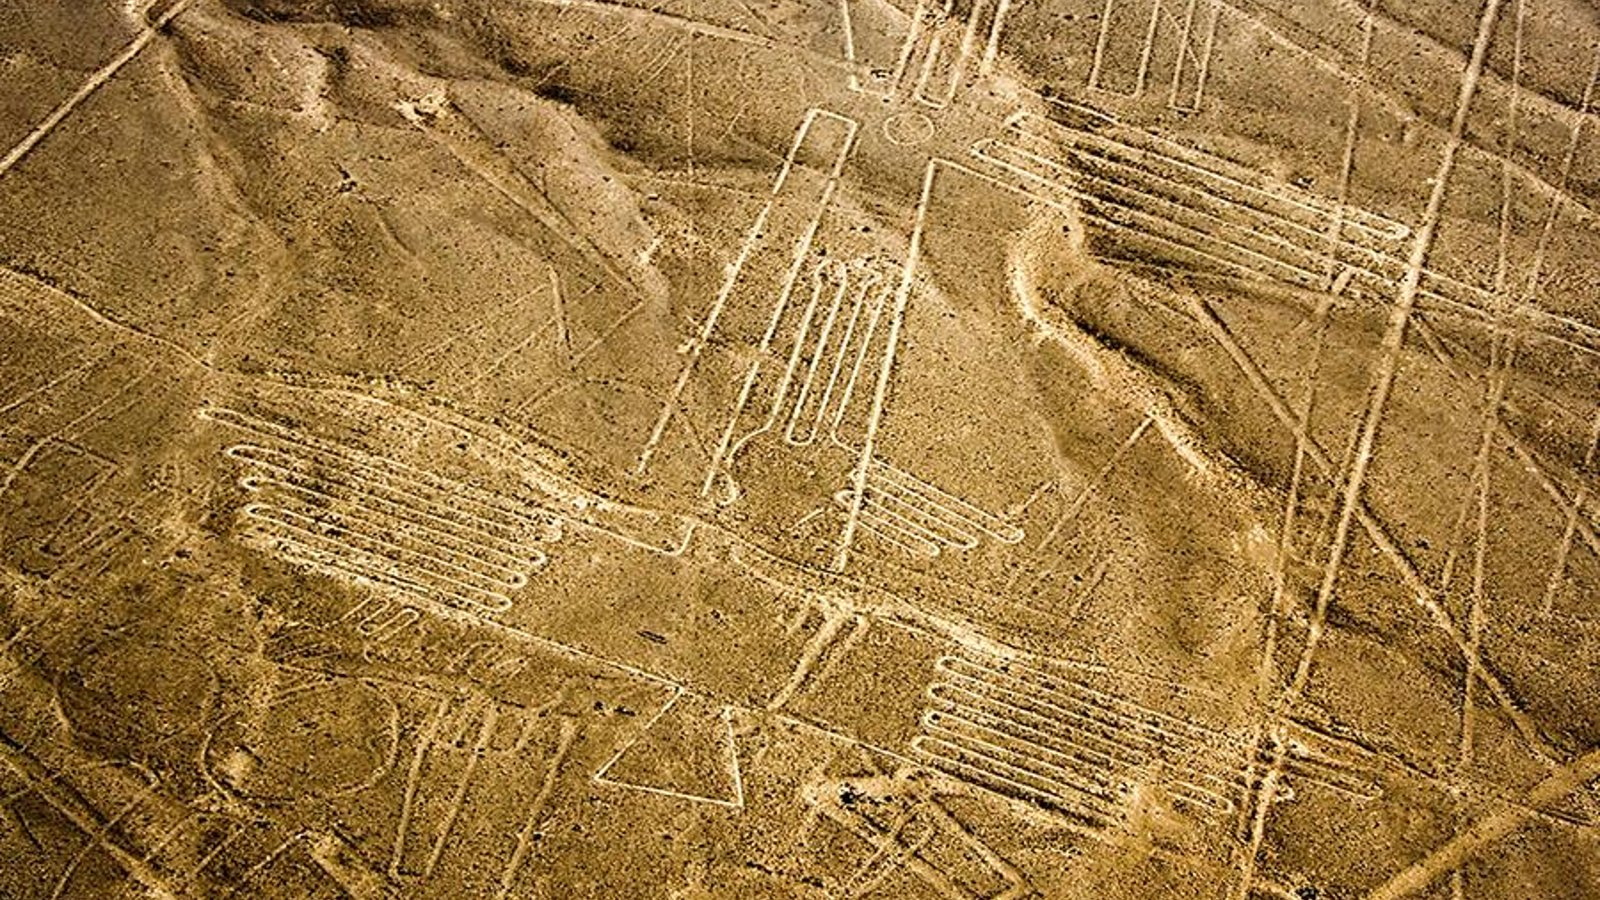 The Nazca Lines, Sipán, and Machu Picchu